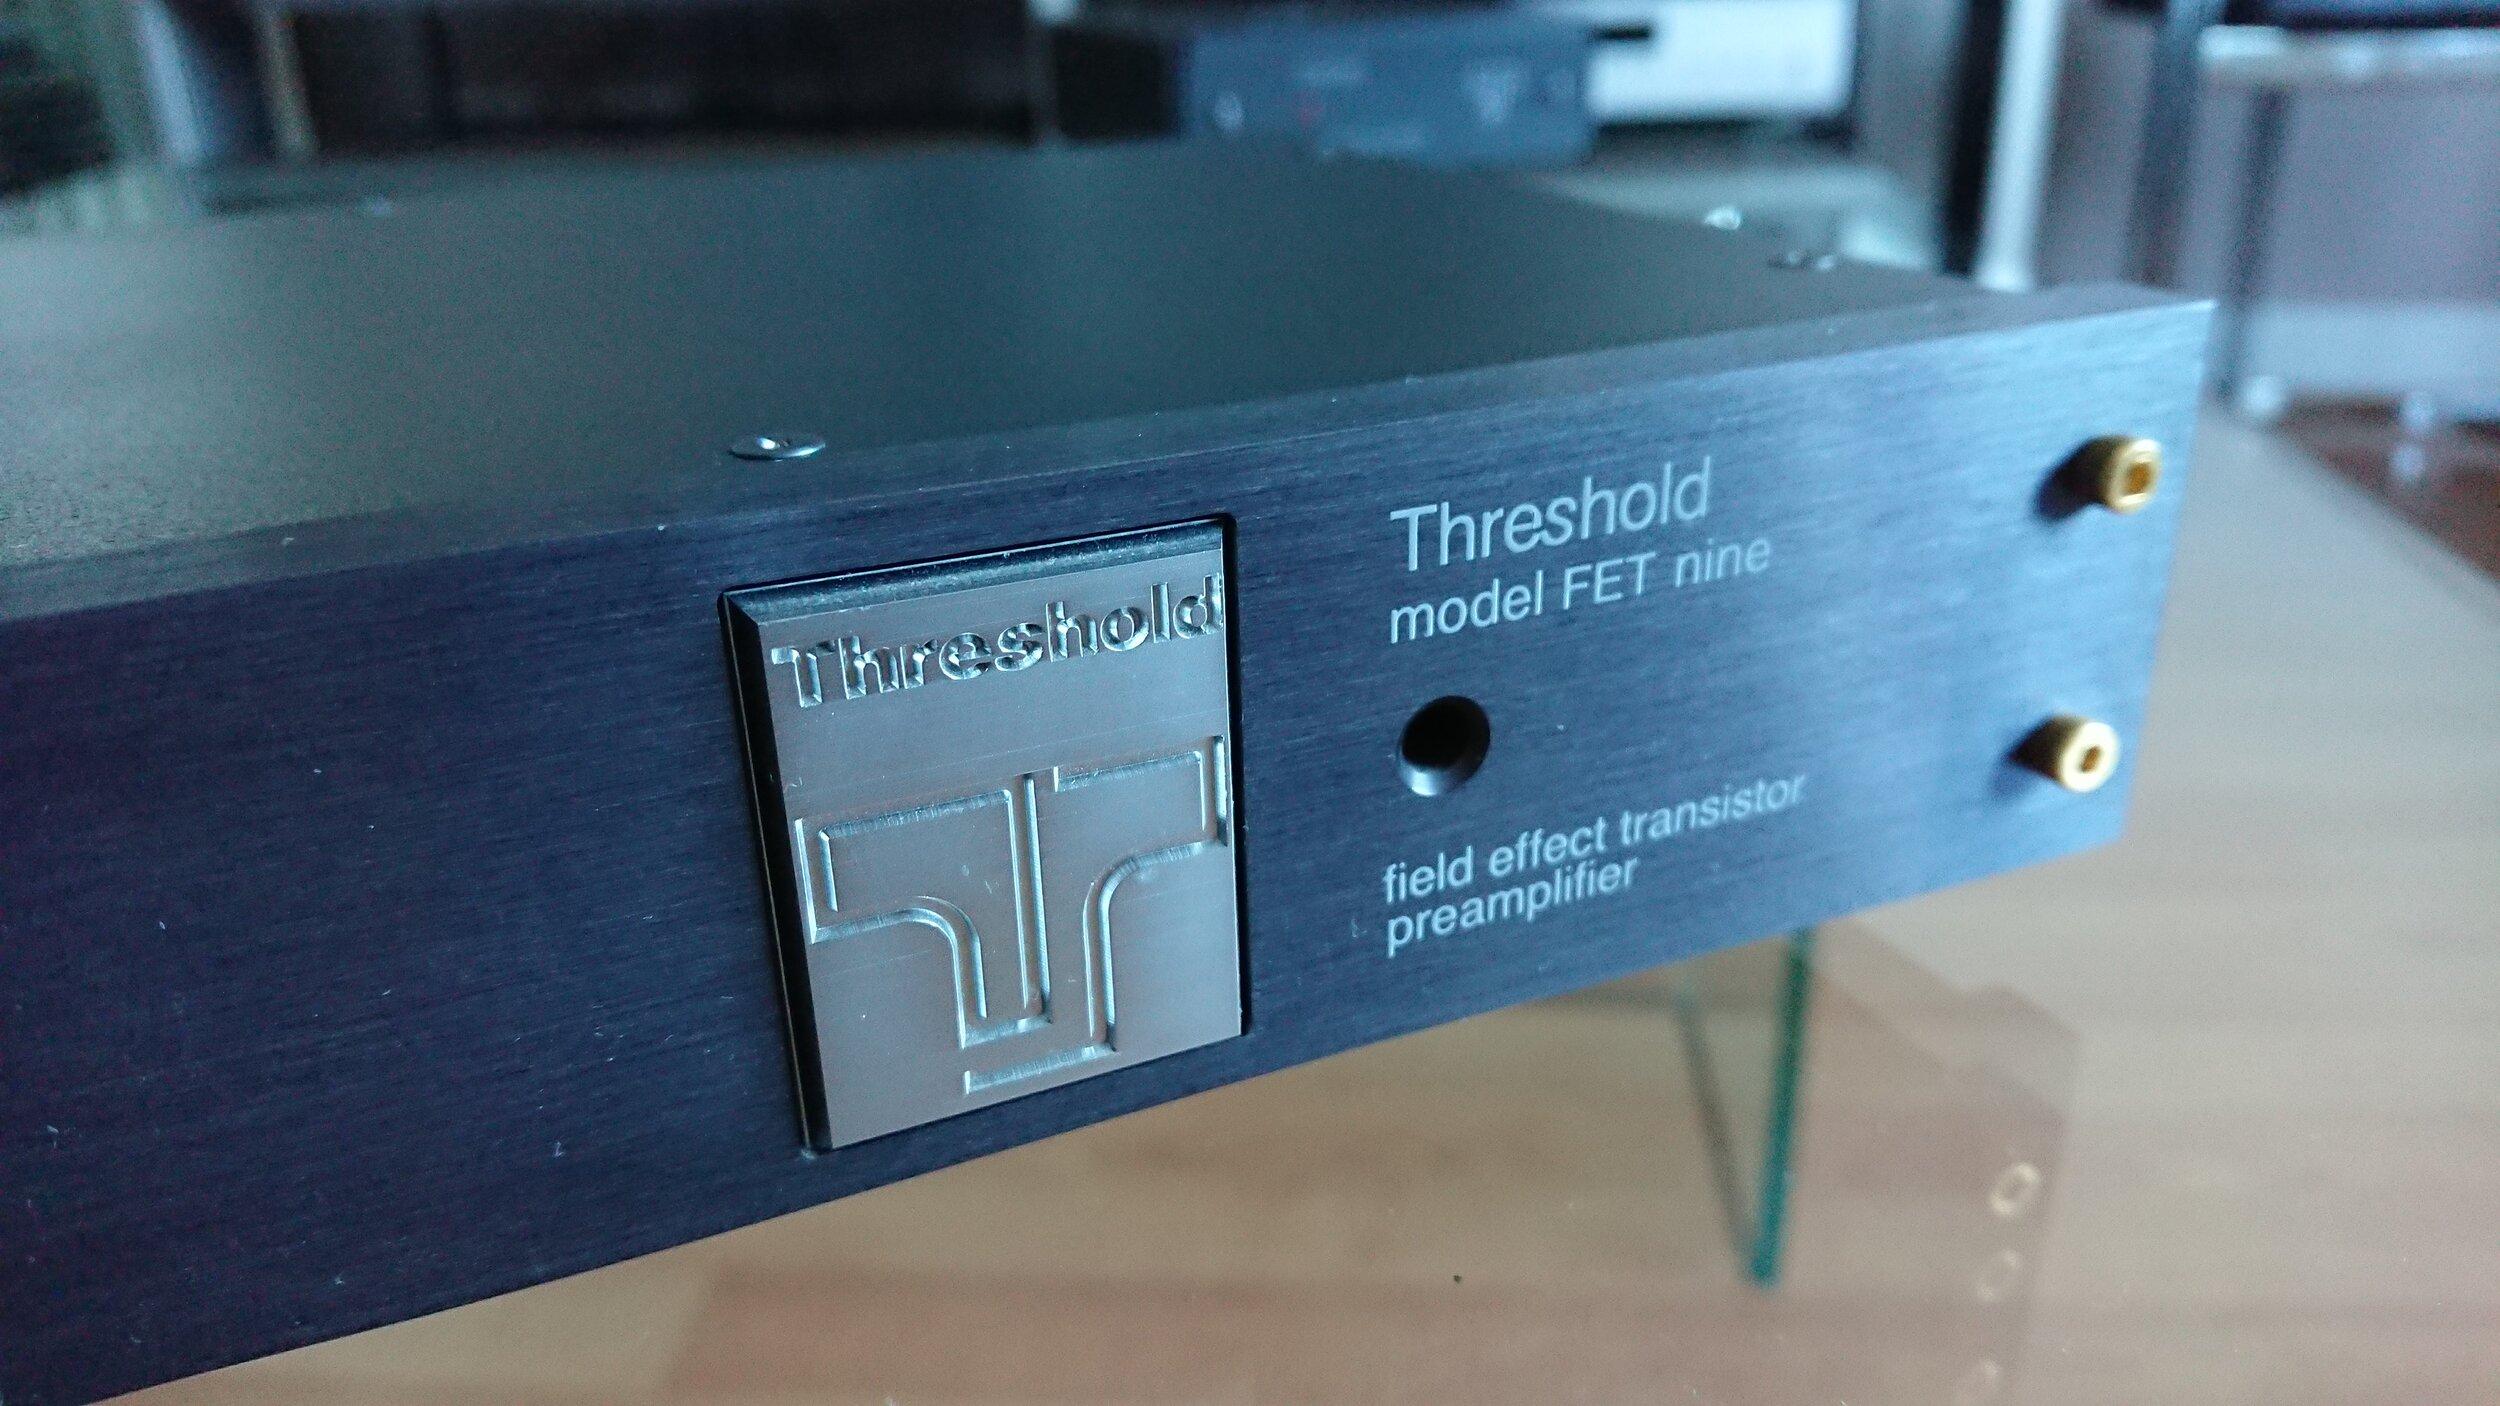 Threshold FET nine pre-amp